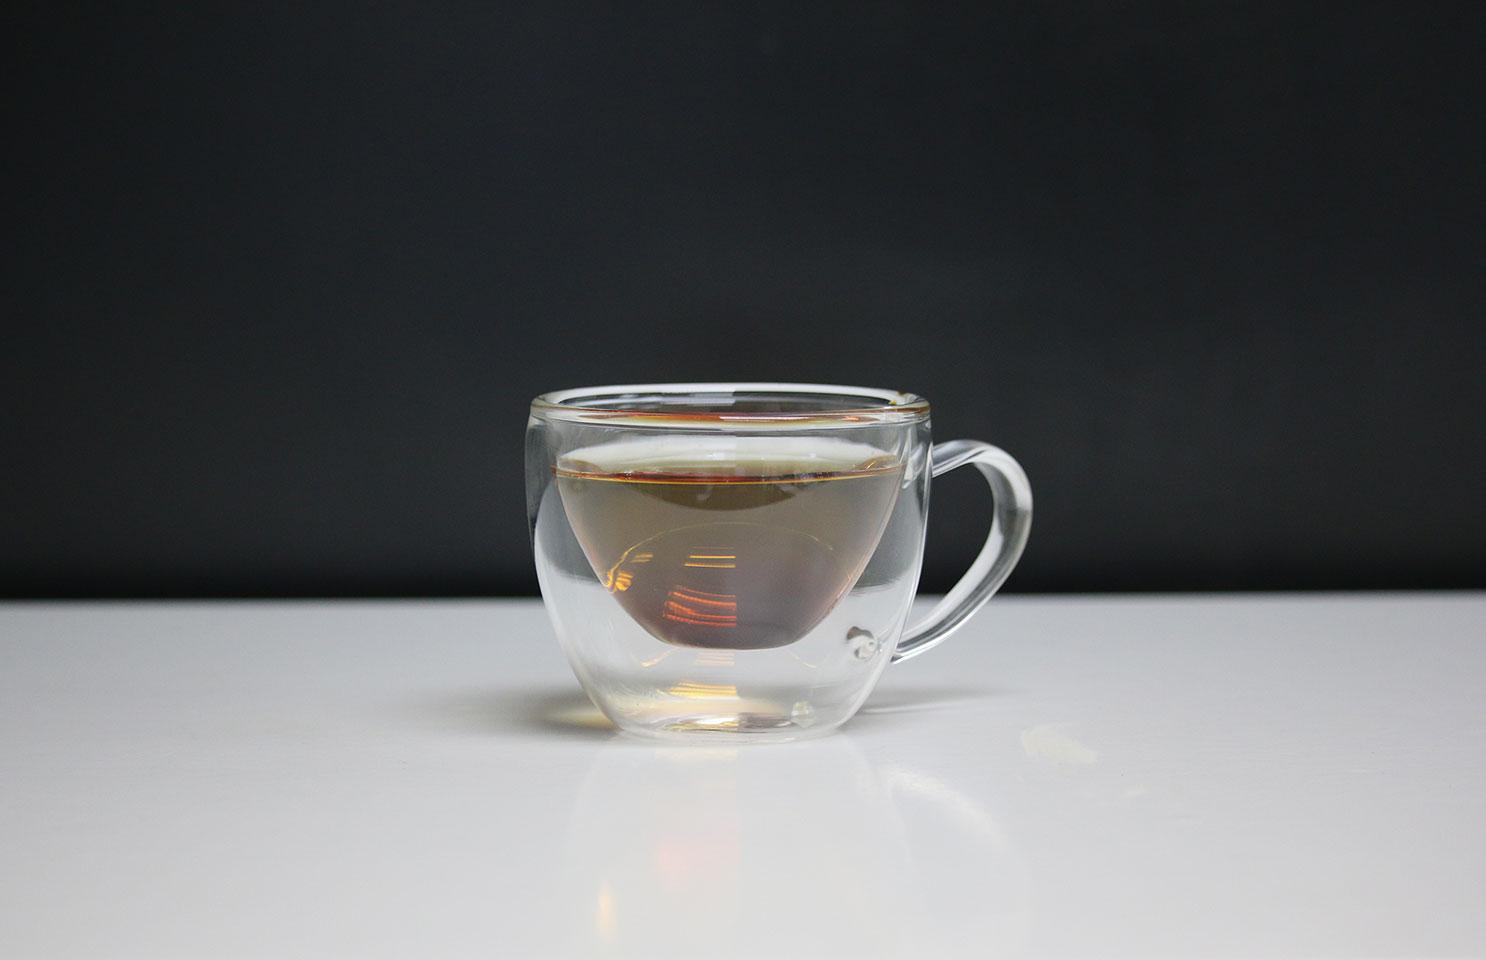 verres caf notre gamme de verrerie qui rendra votre plaisir du caf hors pair. Black Bedroom Furniture Sets. Home Design Ideas